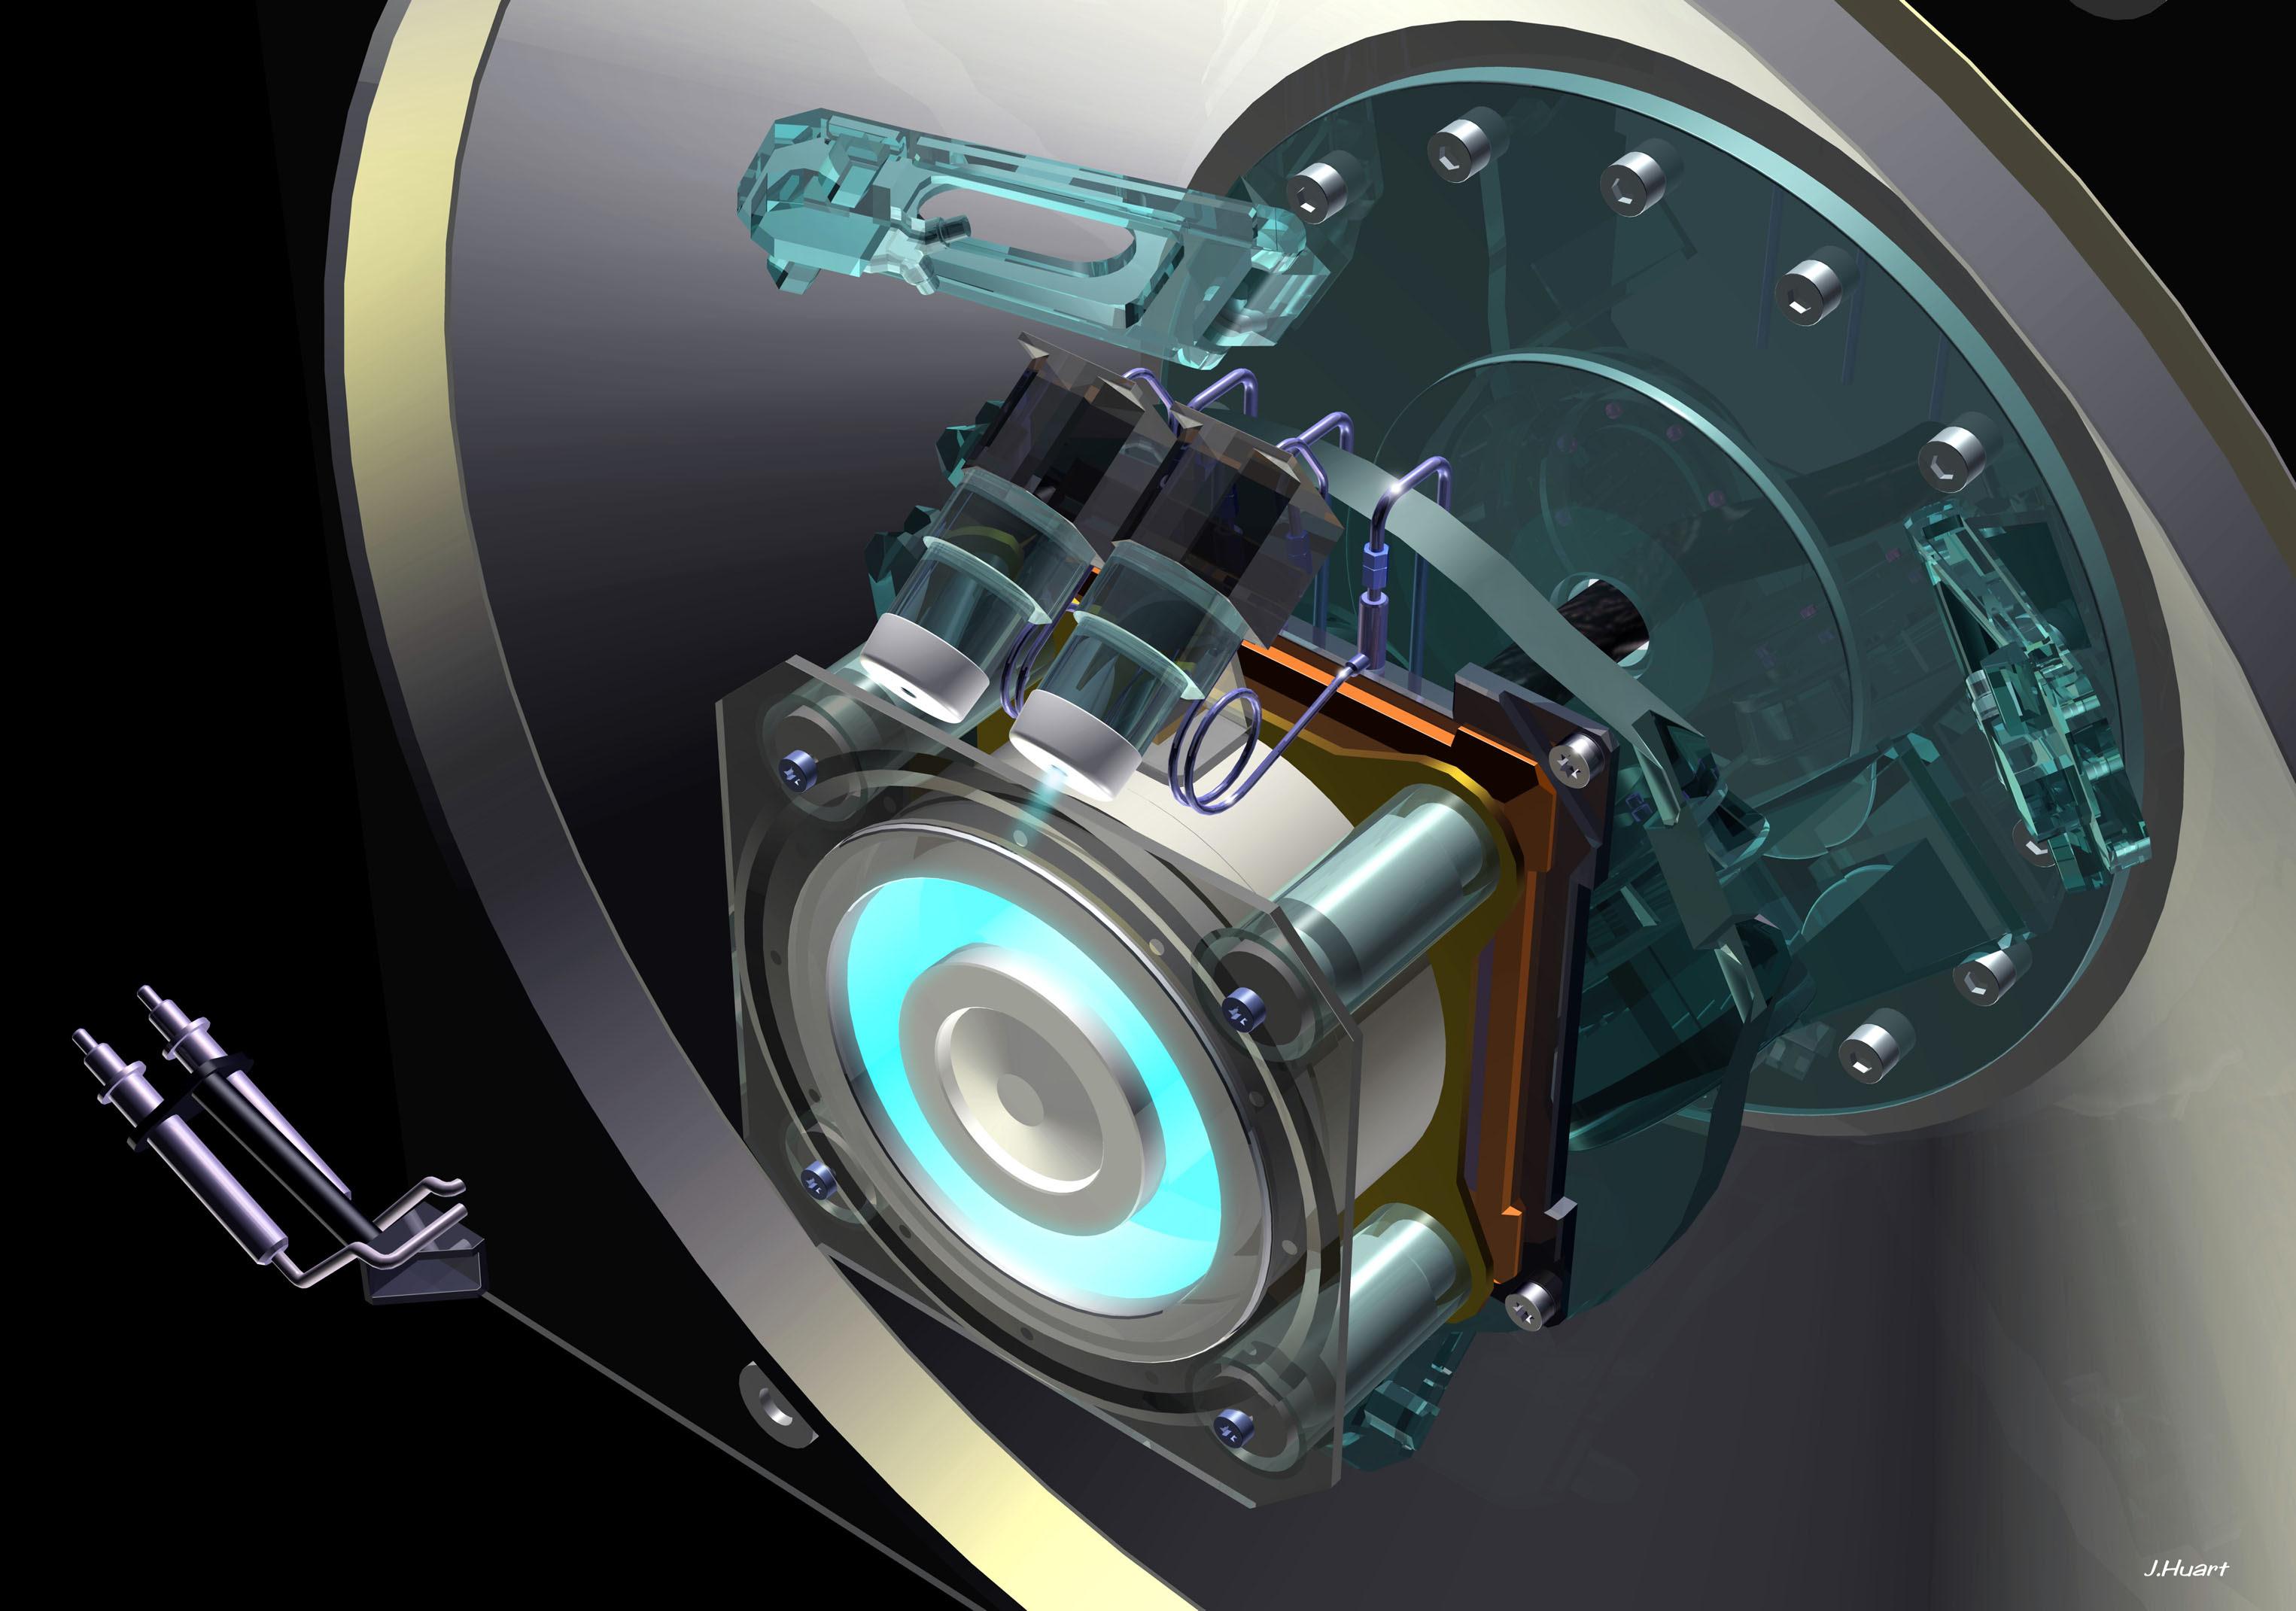 http://esamultimedia.esa.int/images/Science/smart1_101.jpg